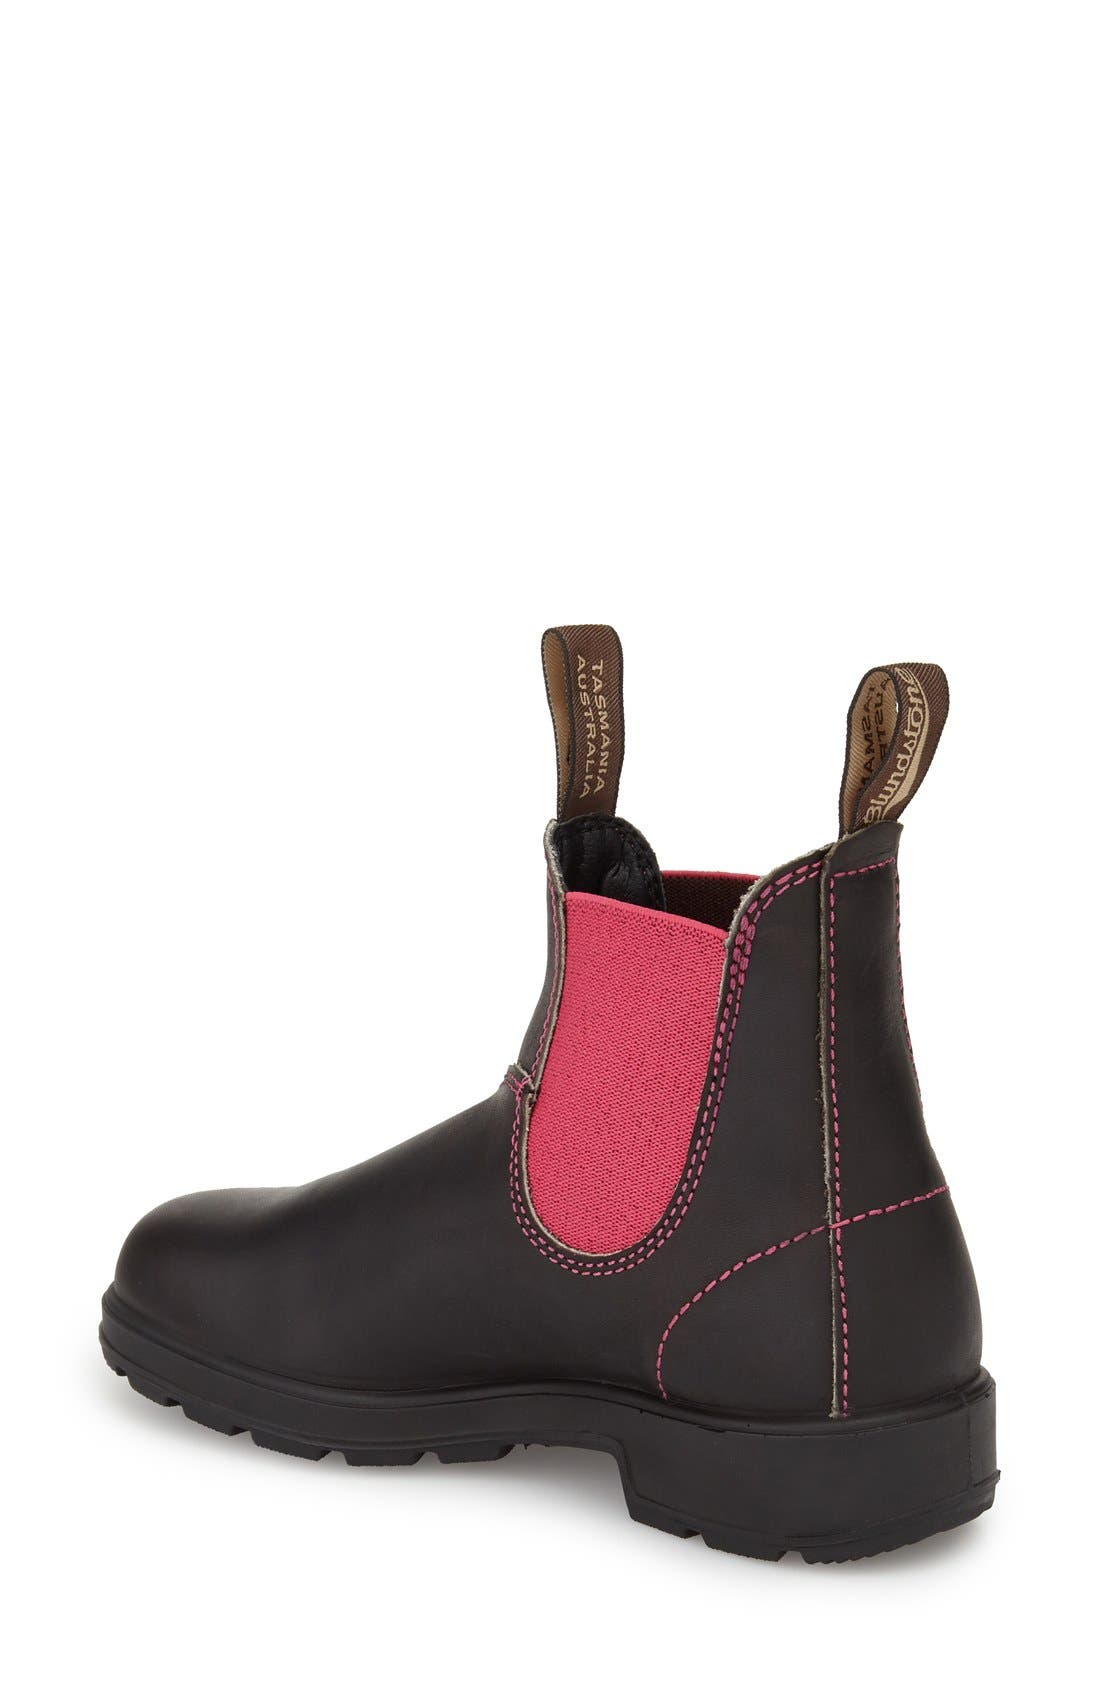 Footwear 'Original - 500 Series' Water Resistant Chelsea Boot,                             Alternate thumbnail 2, color,                             200